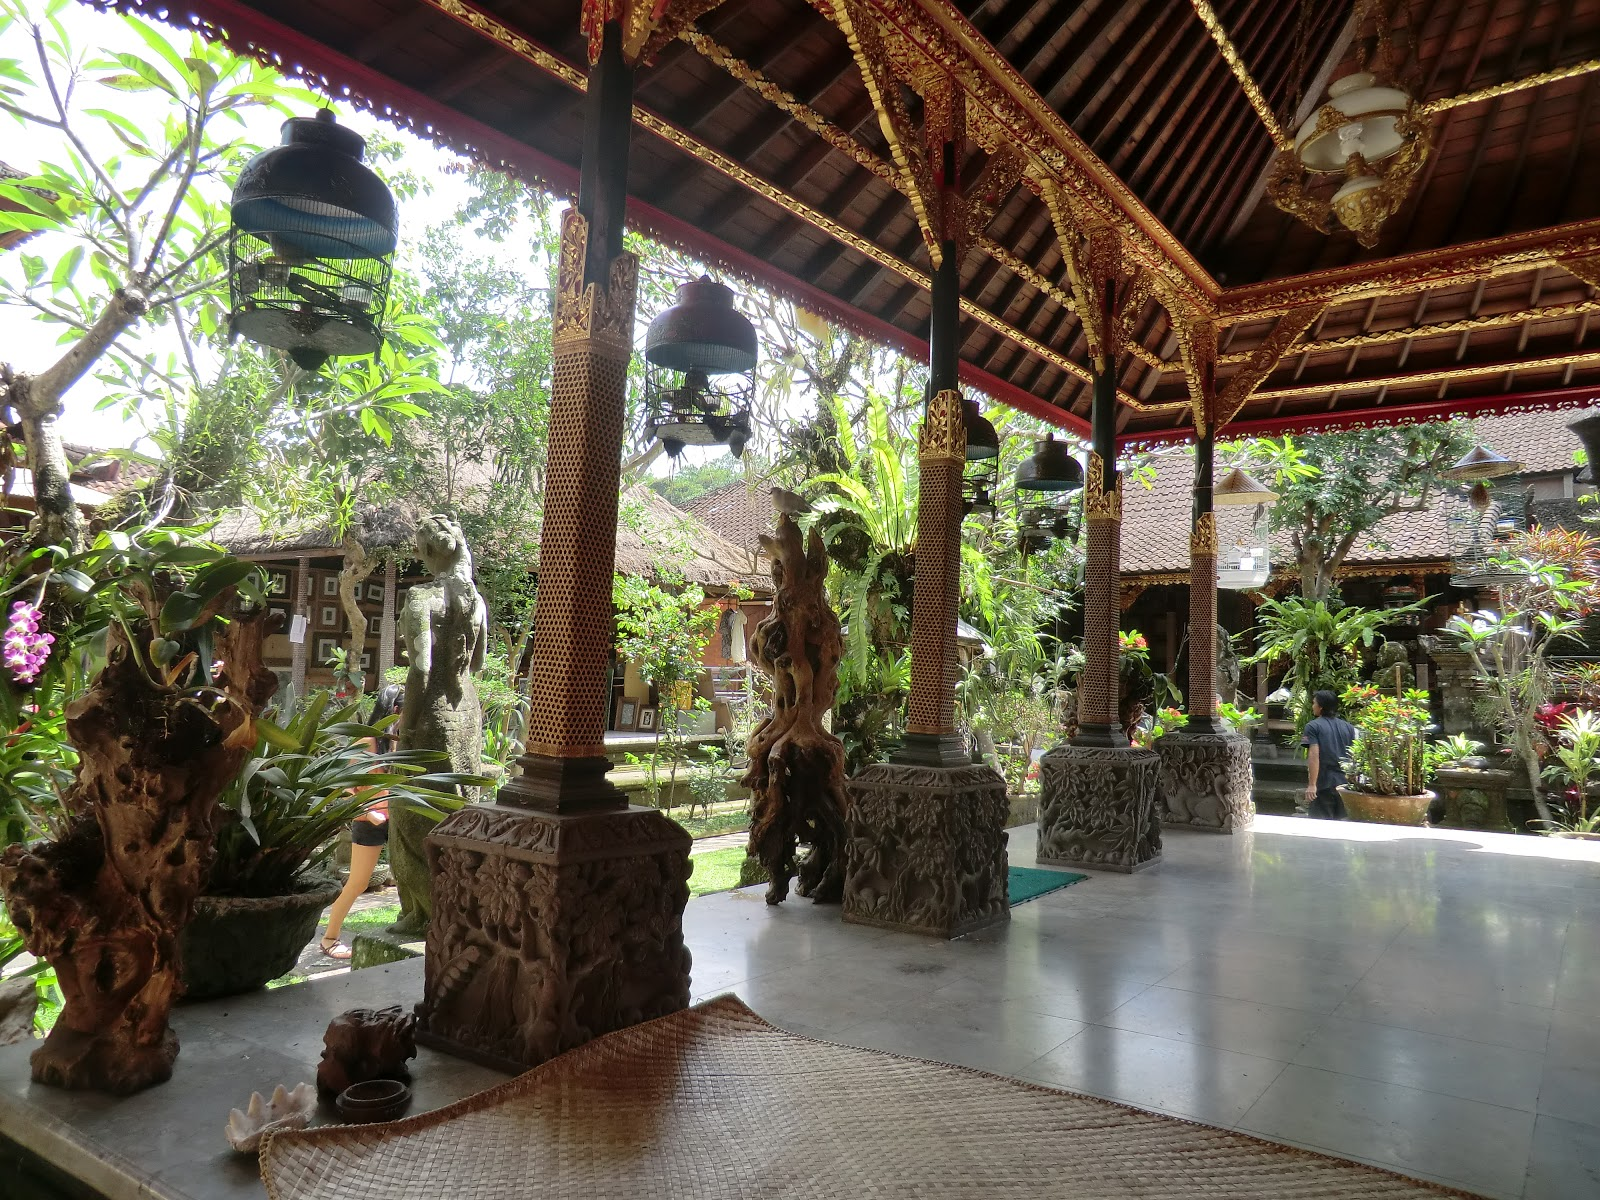 El mundo a tus pies saboreando indonesia ix - Artesania de indonesia ...